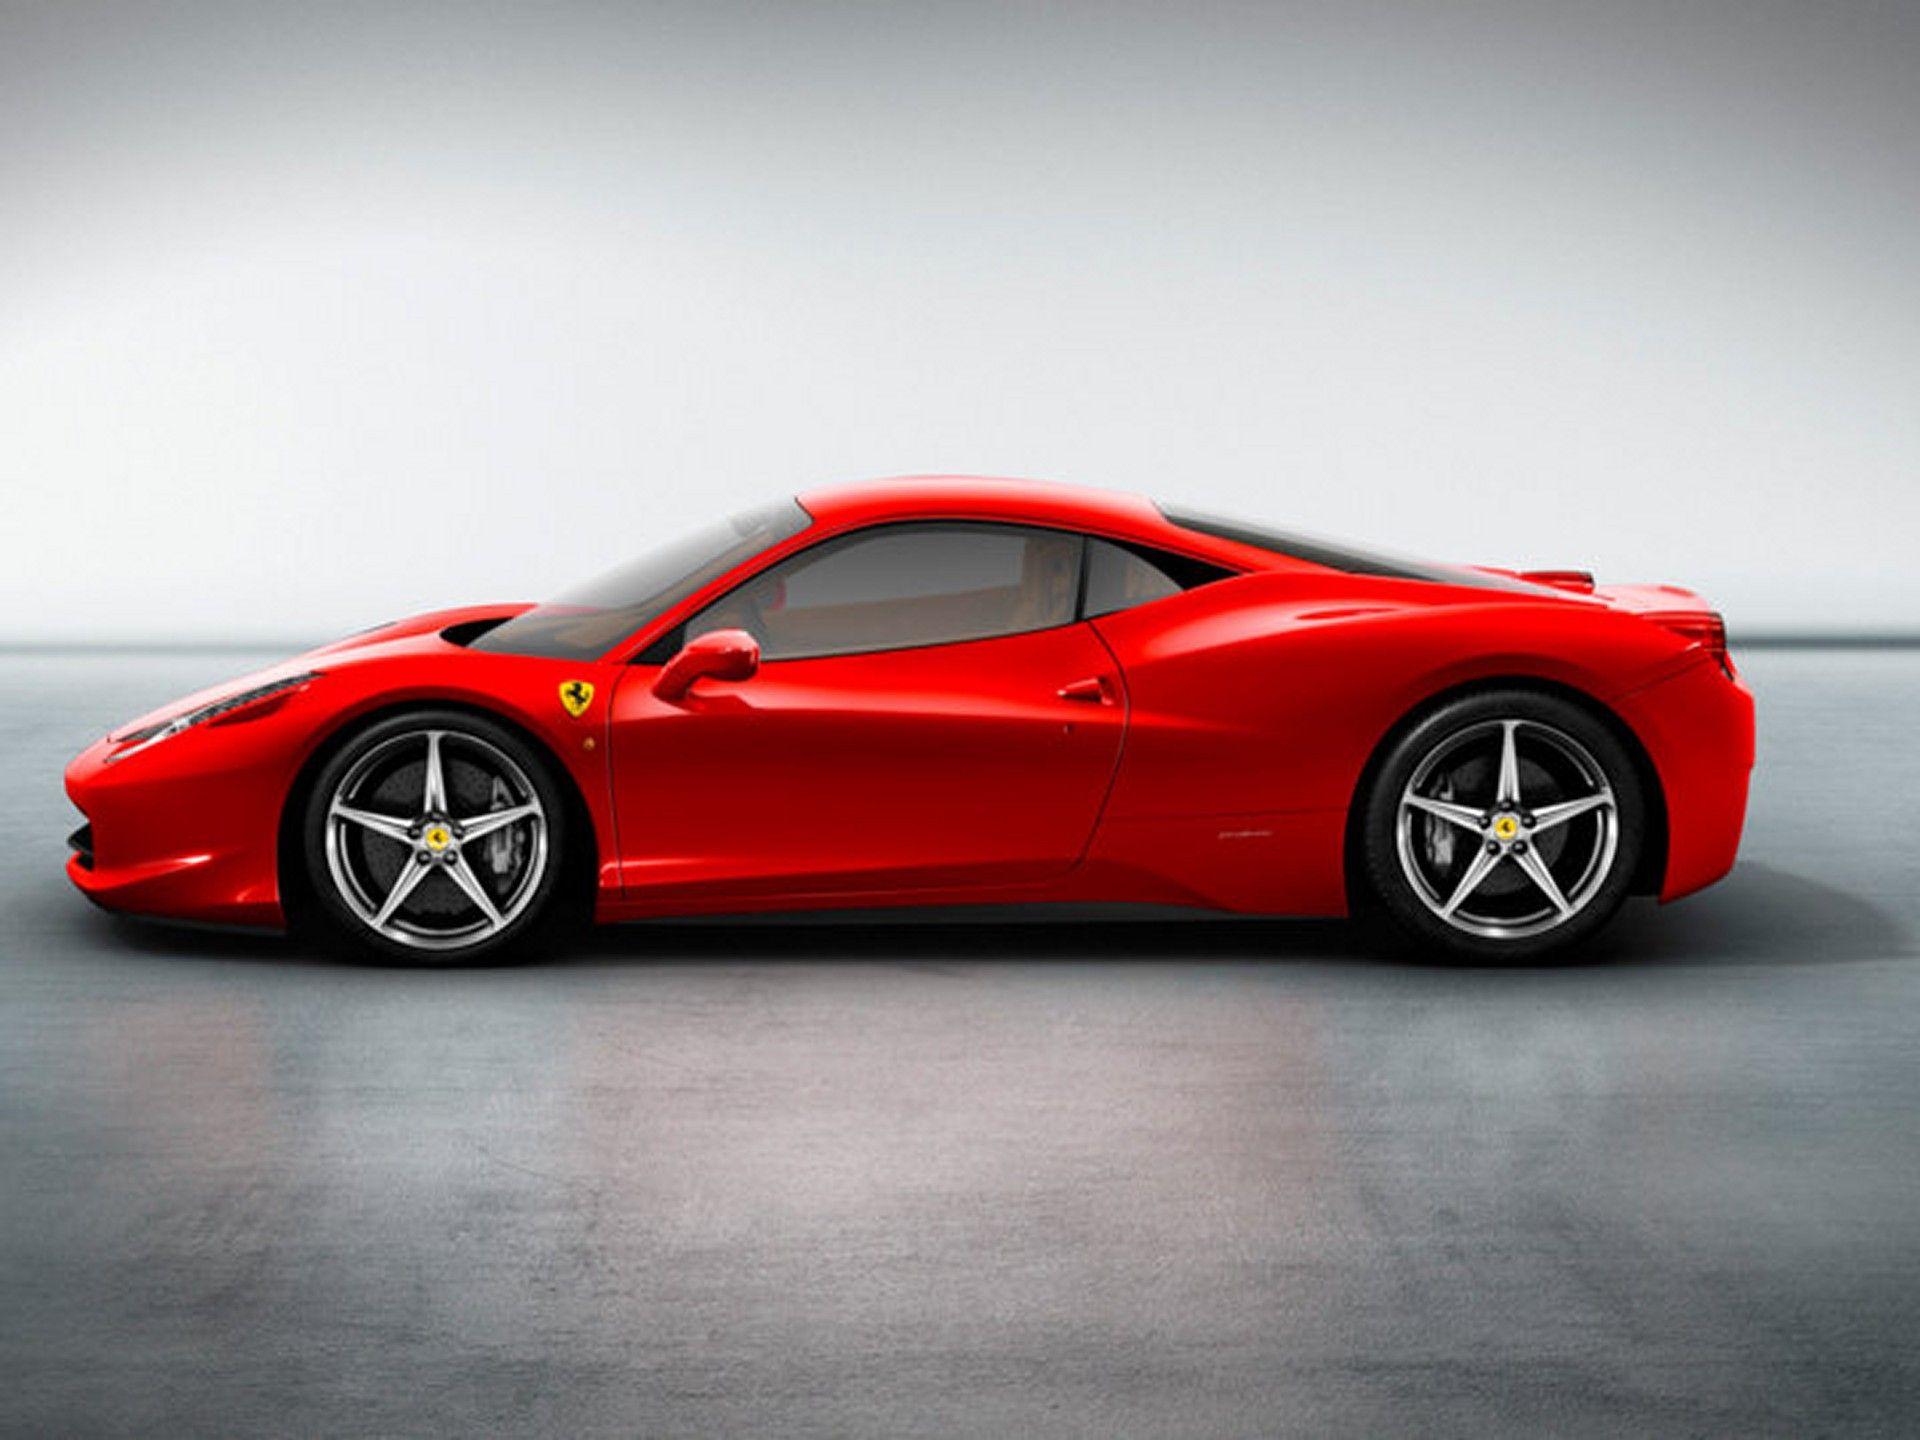 The 25 best ferrari 458 price ideas on pinterest ferrari auto la ferrari and ferrari